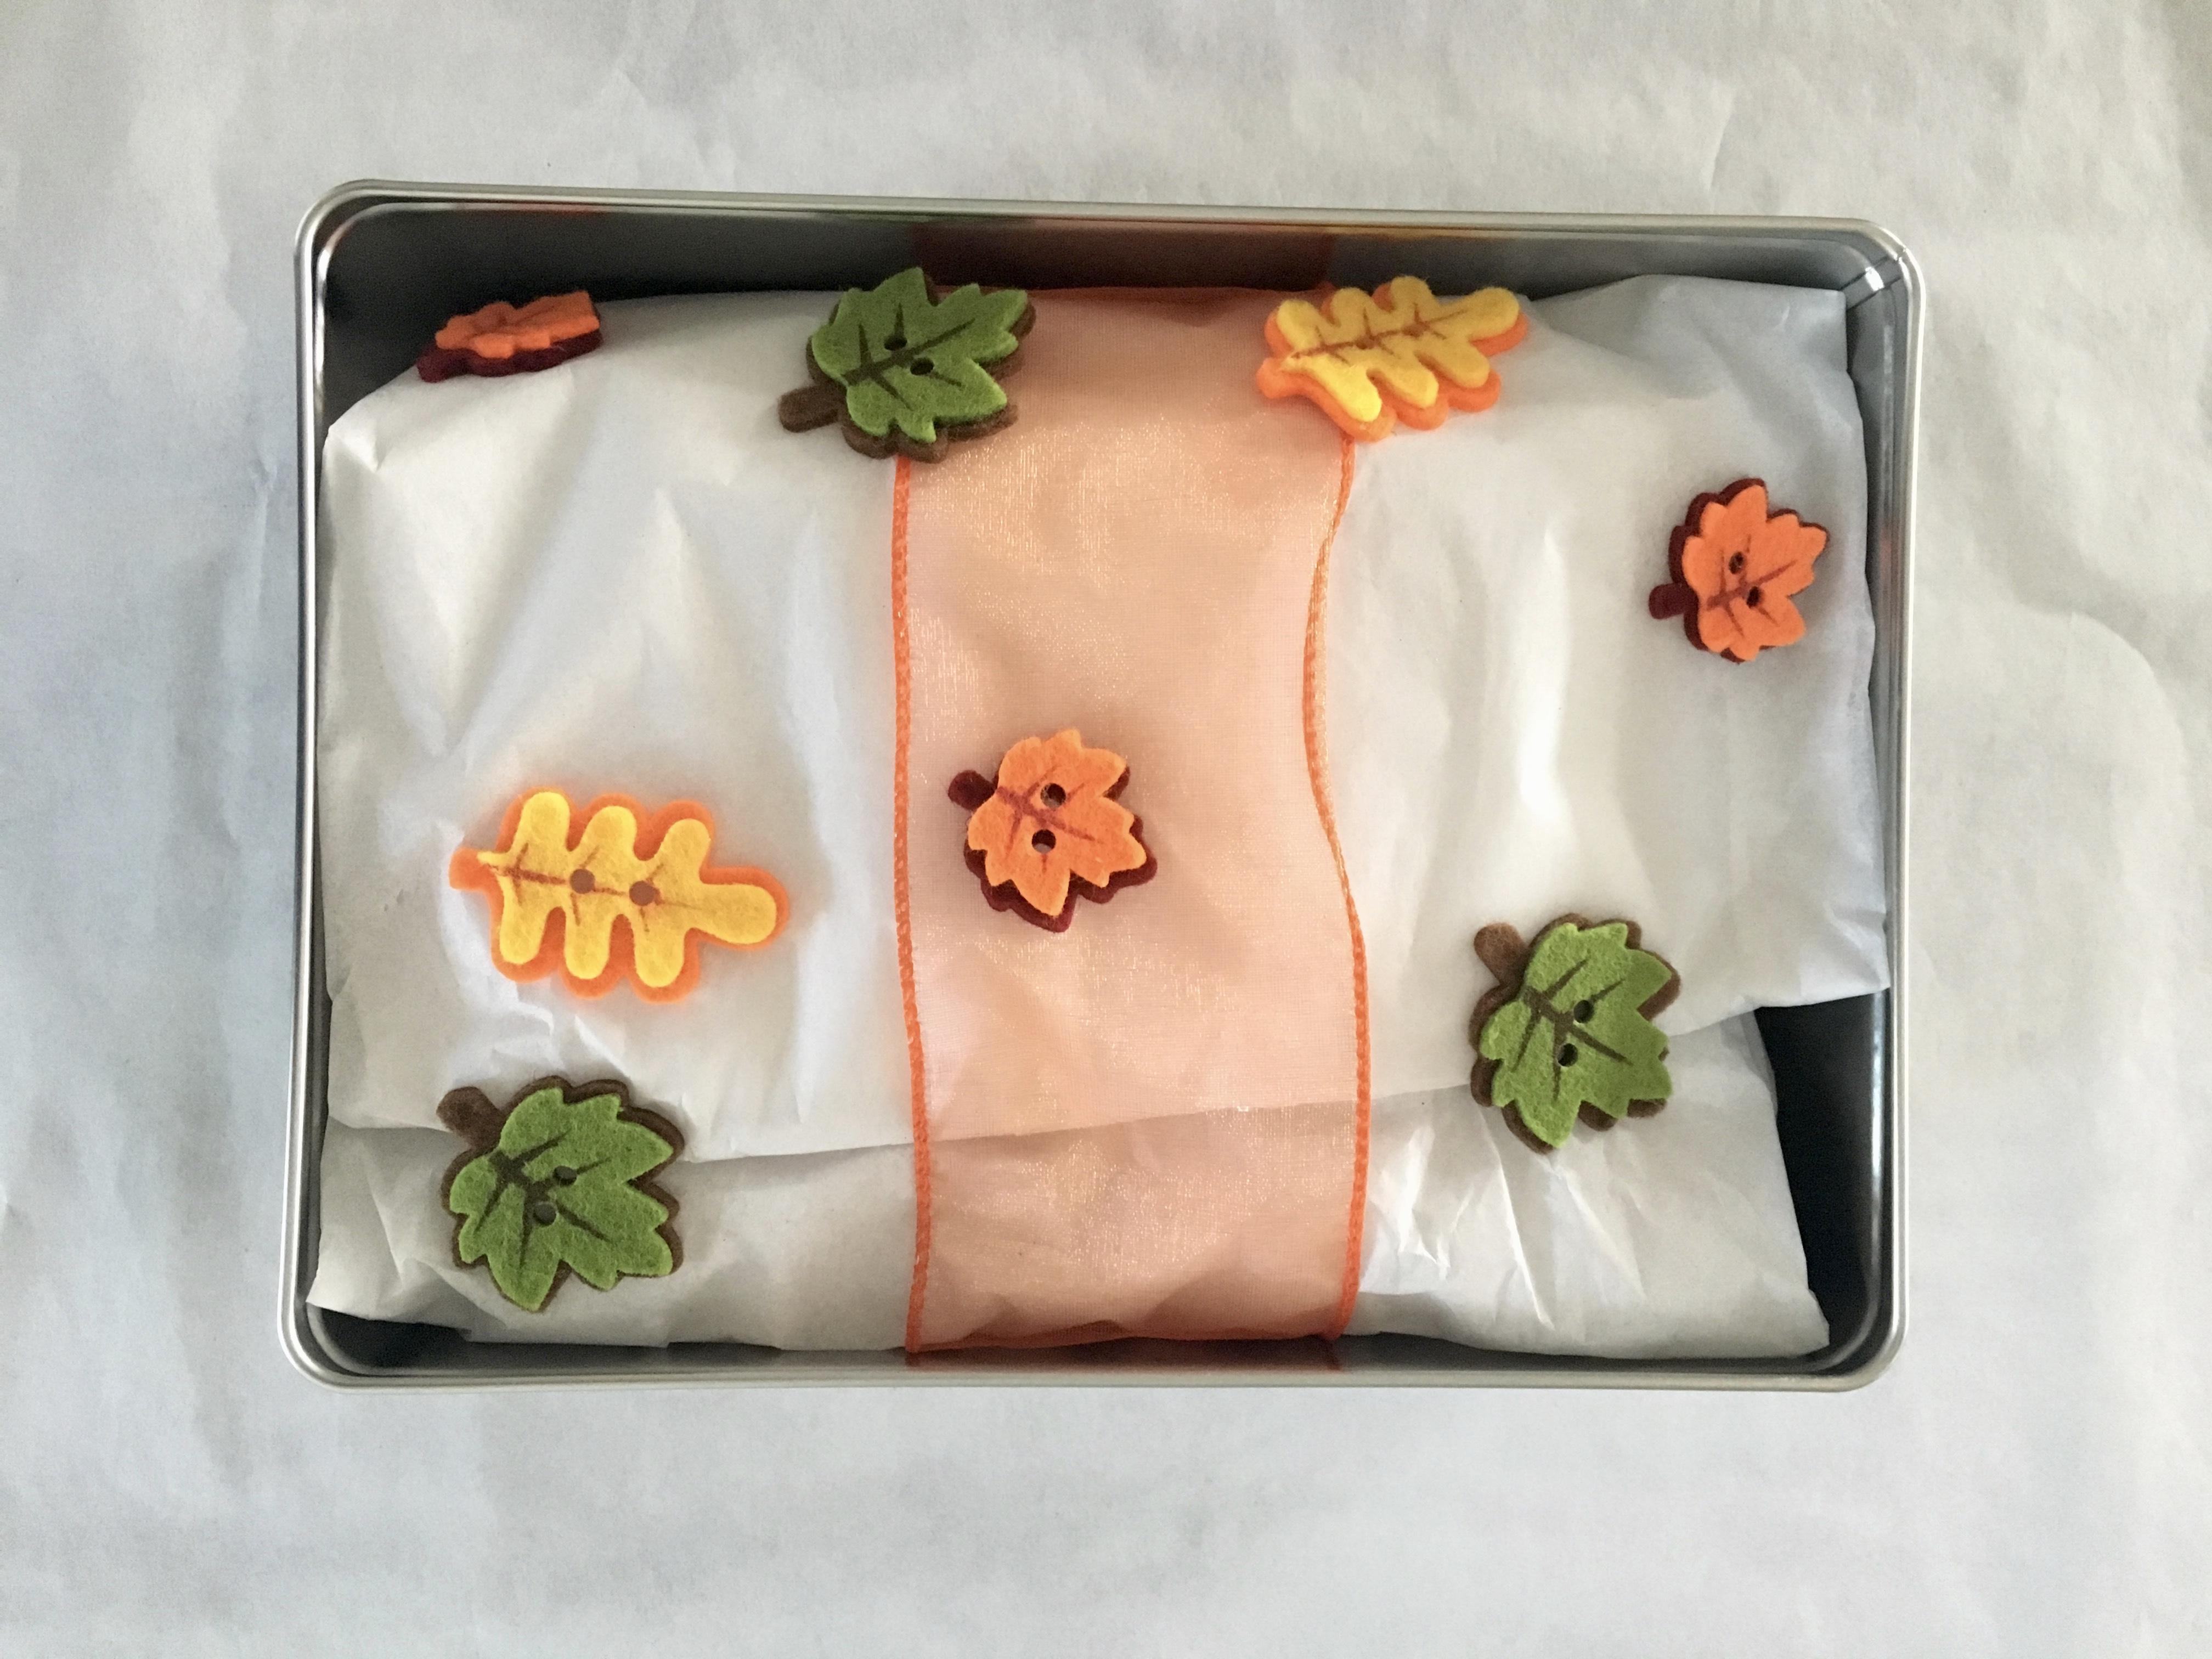 Sending cookies in the mail